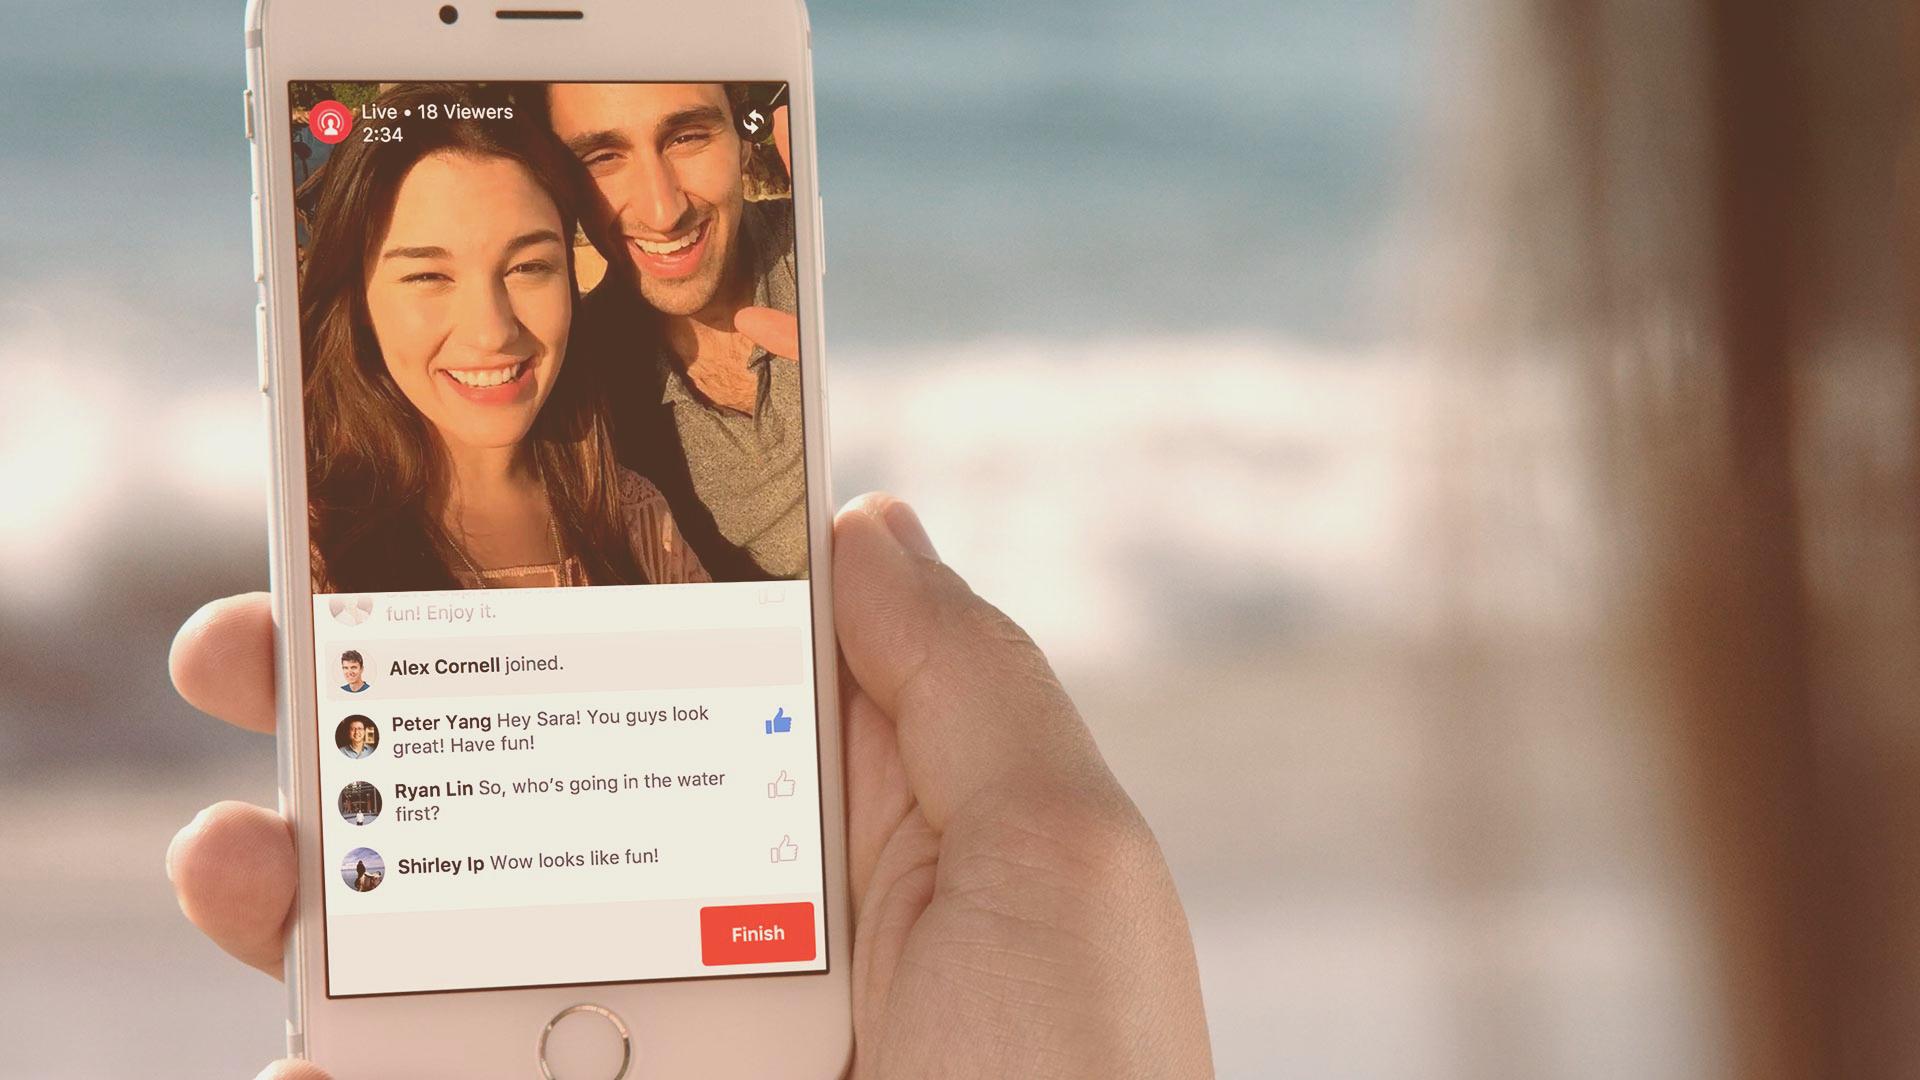 Facebook: a qualcuno piace live